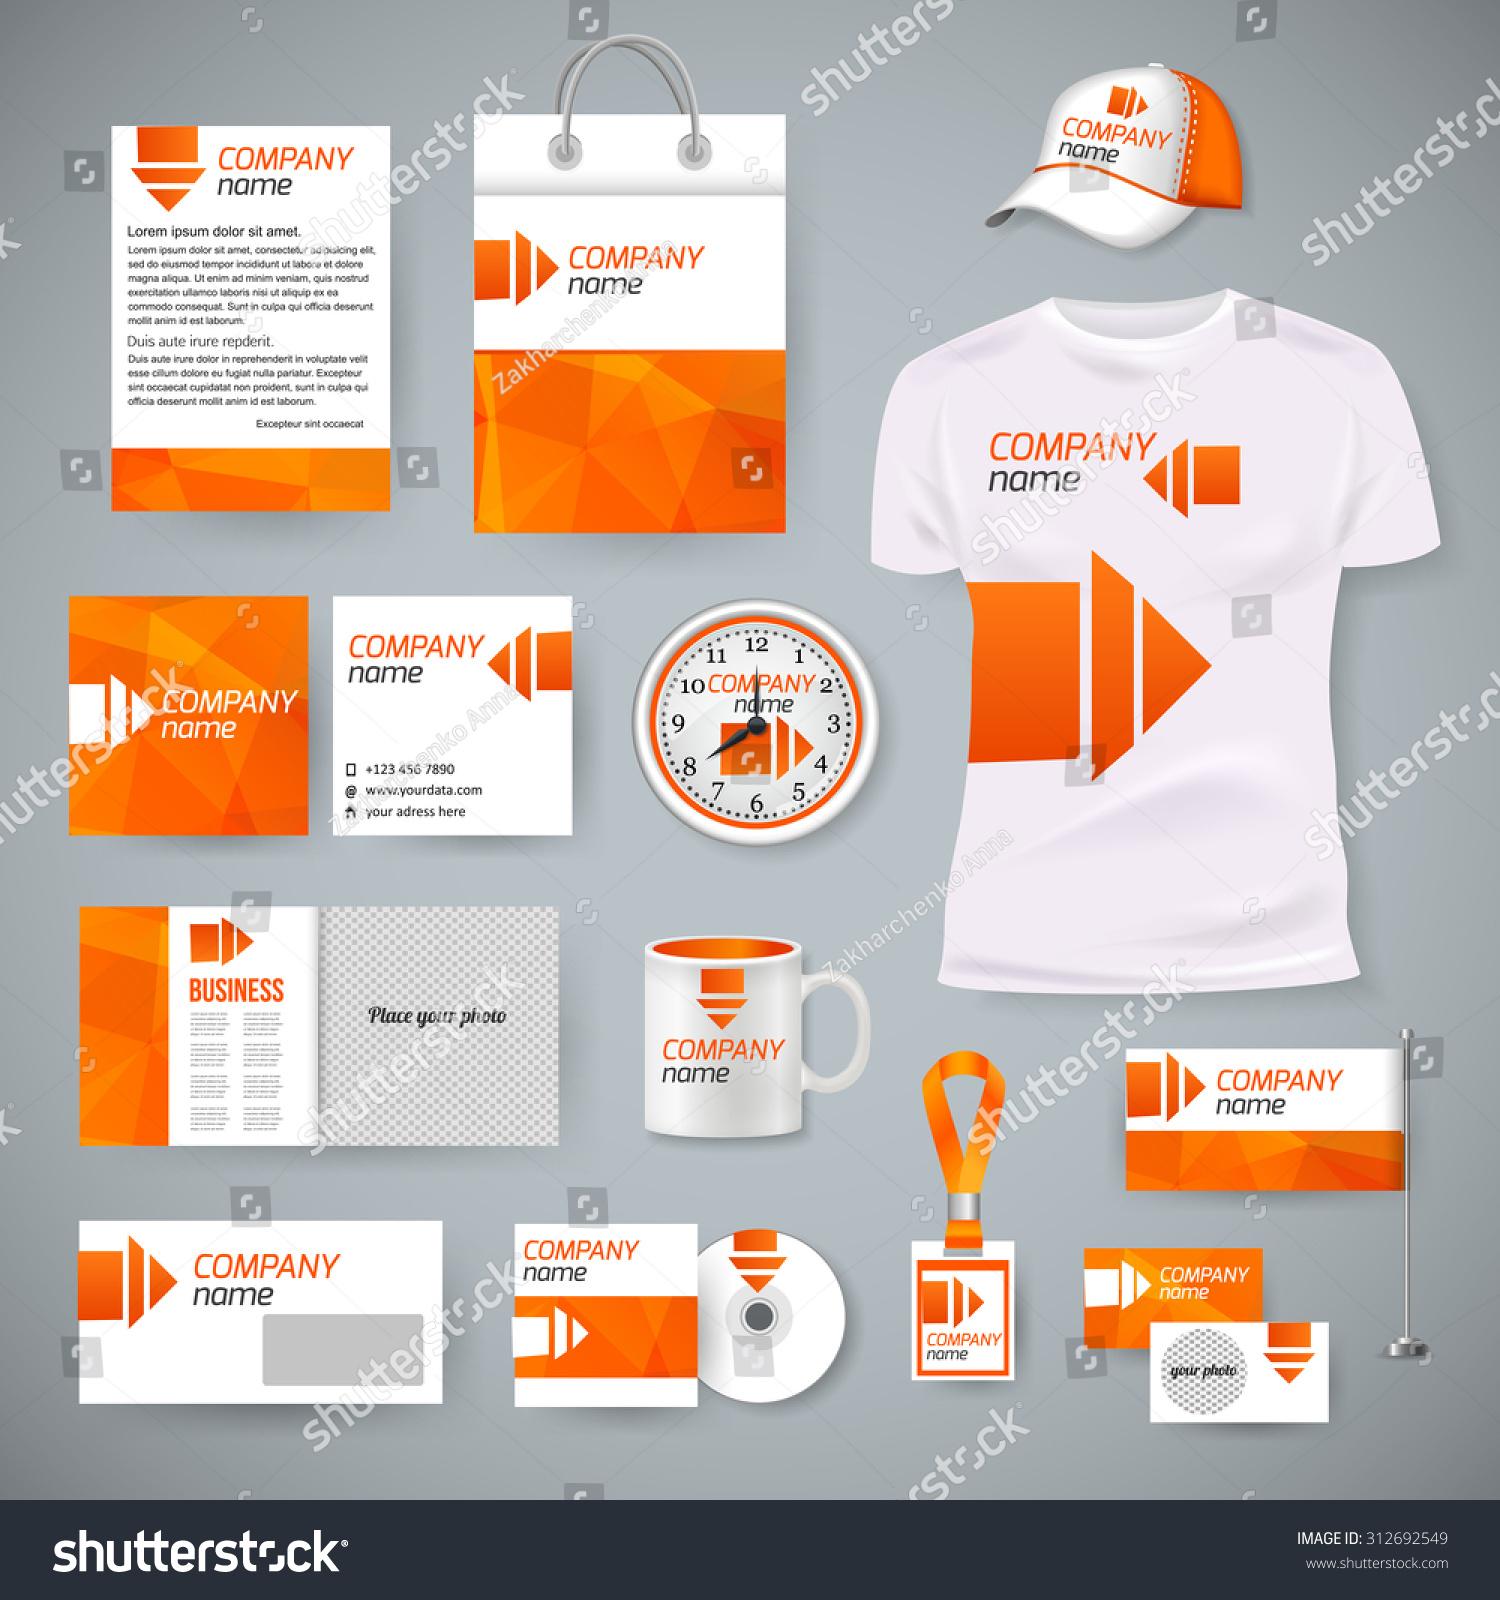 Corporate Identity Business Photorealistic Design Template Stock ...